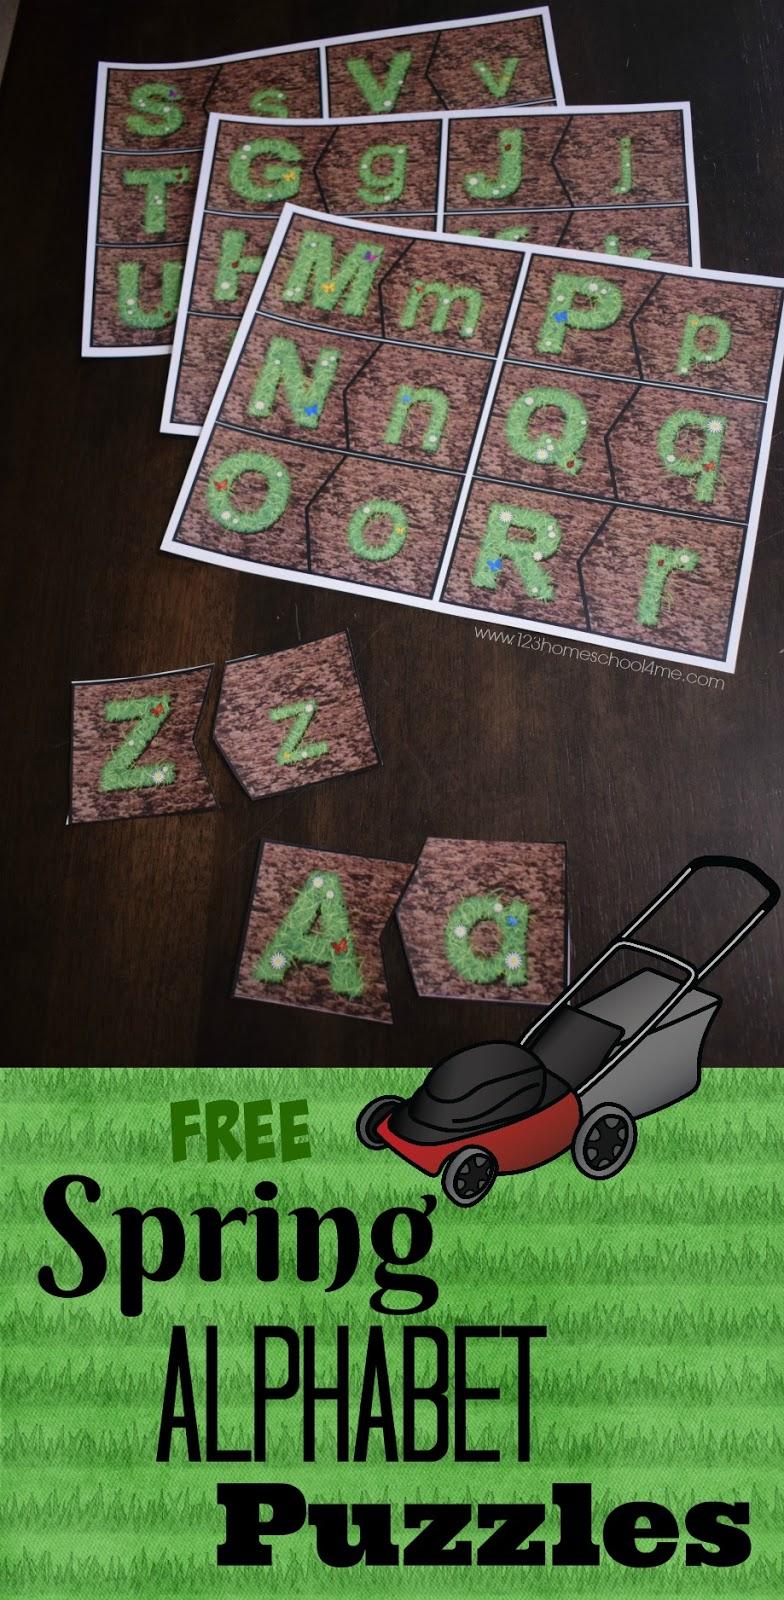 FREE Spring ABC Games